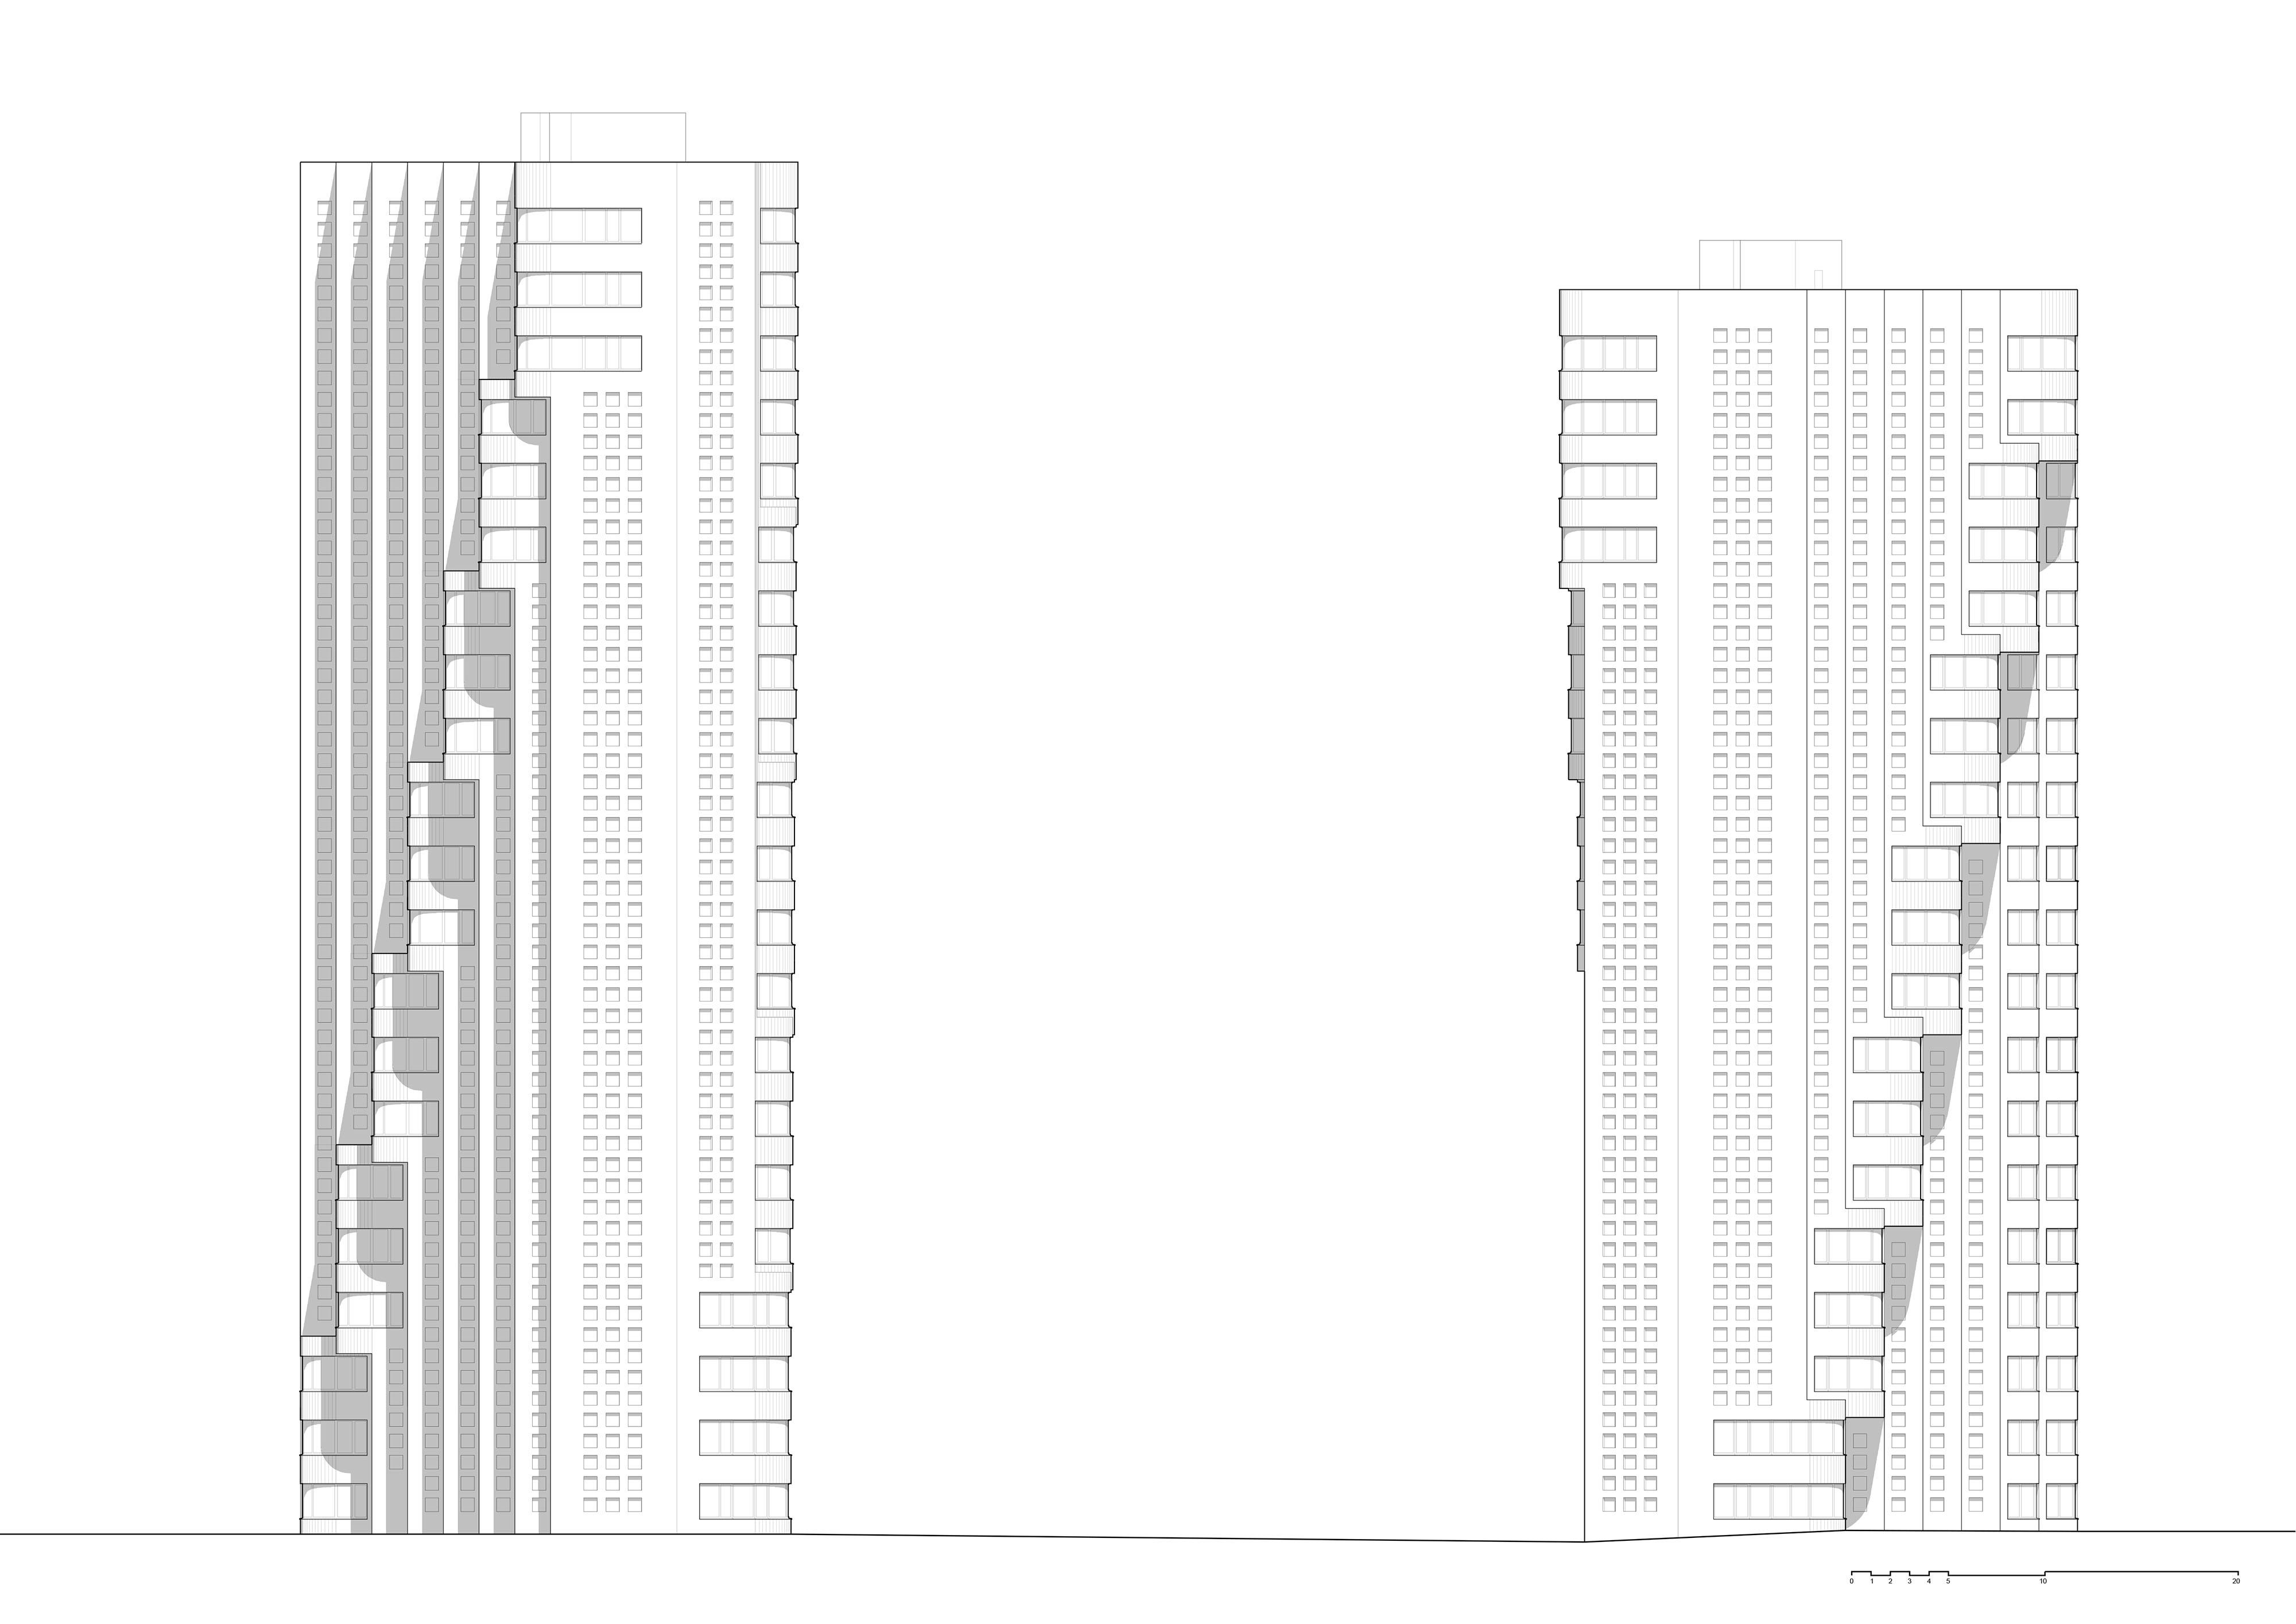 <p>Appartementencomplex in Moskou – Team Paul de Vroom + Sputnik</p>